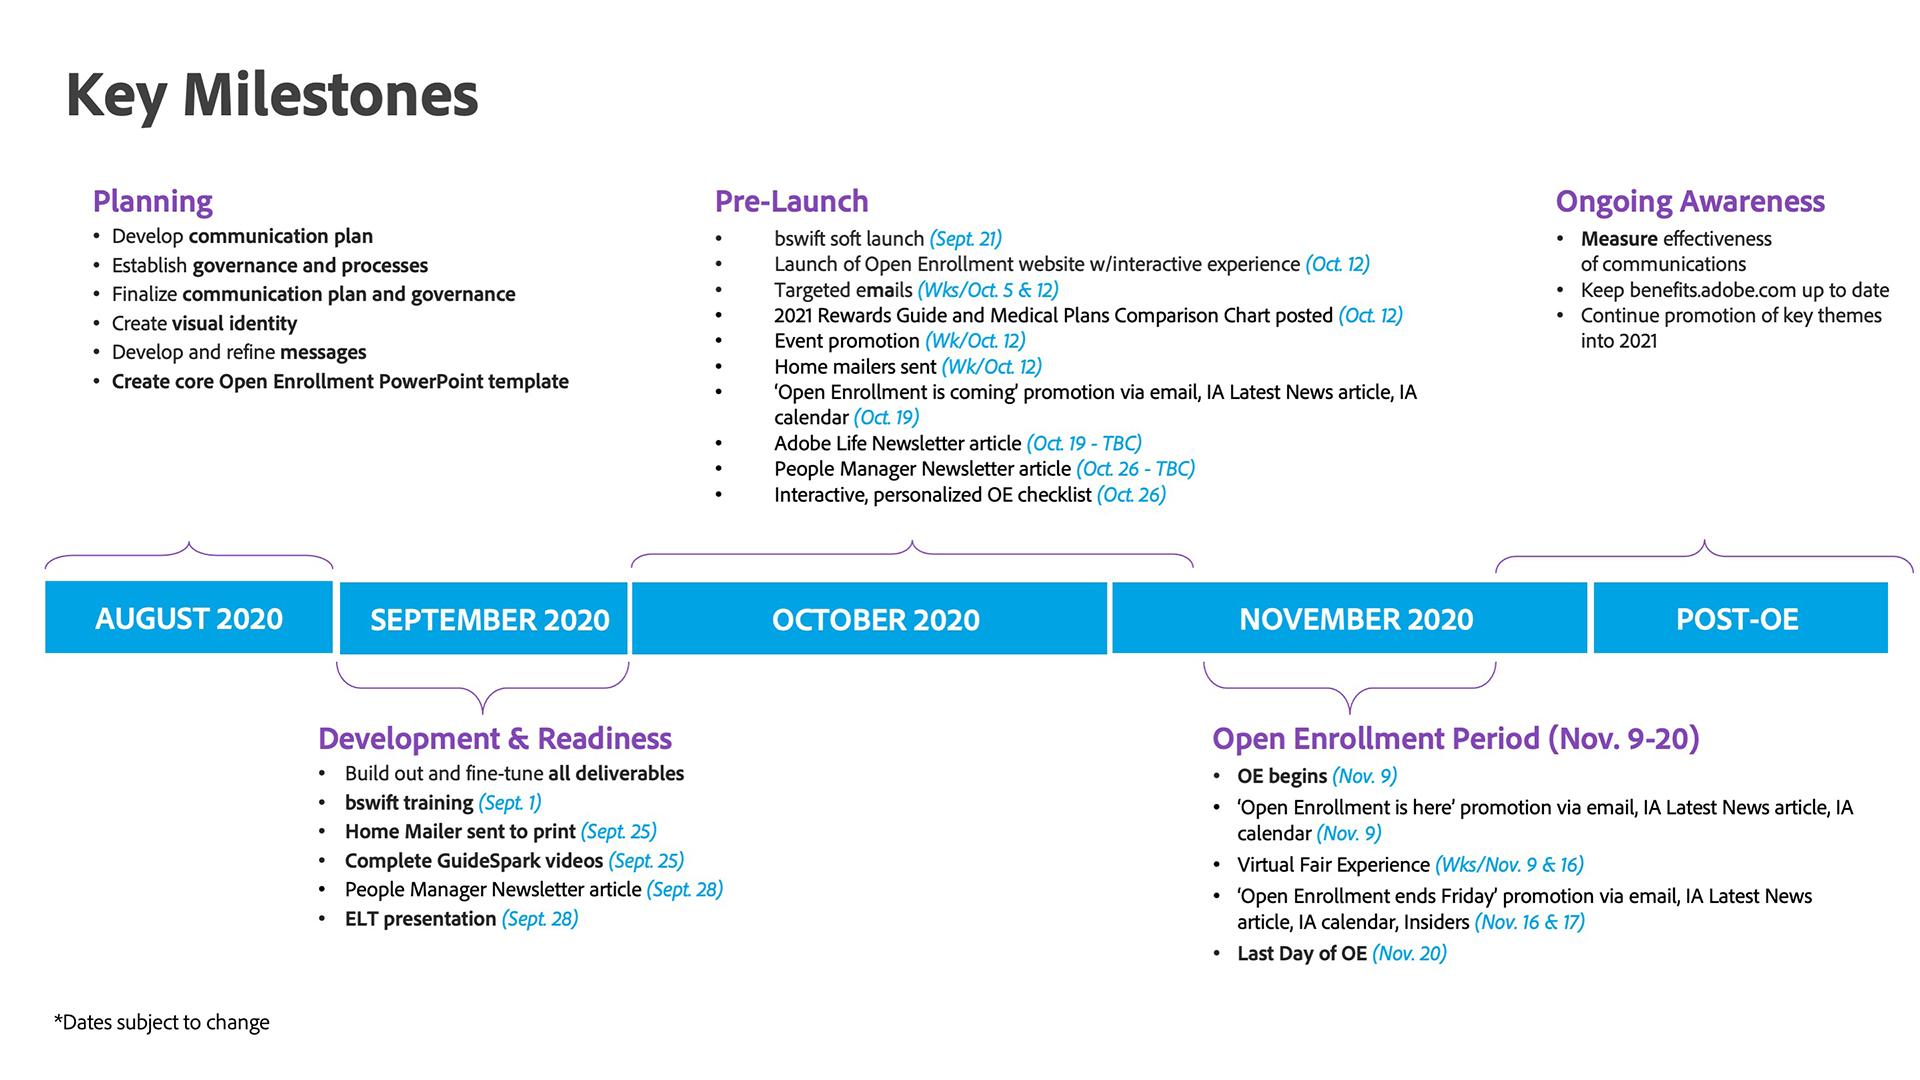 Adobe 2021 Open Enrollment Key Milestones